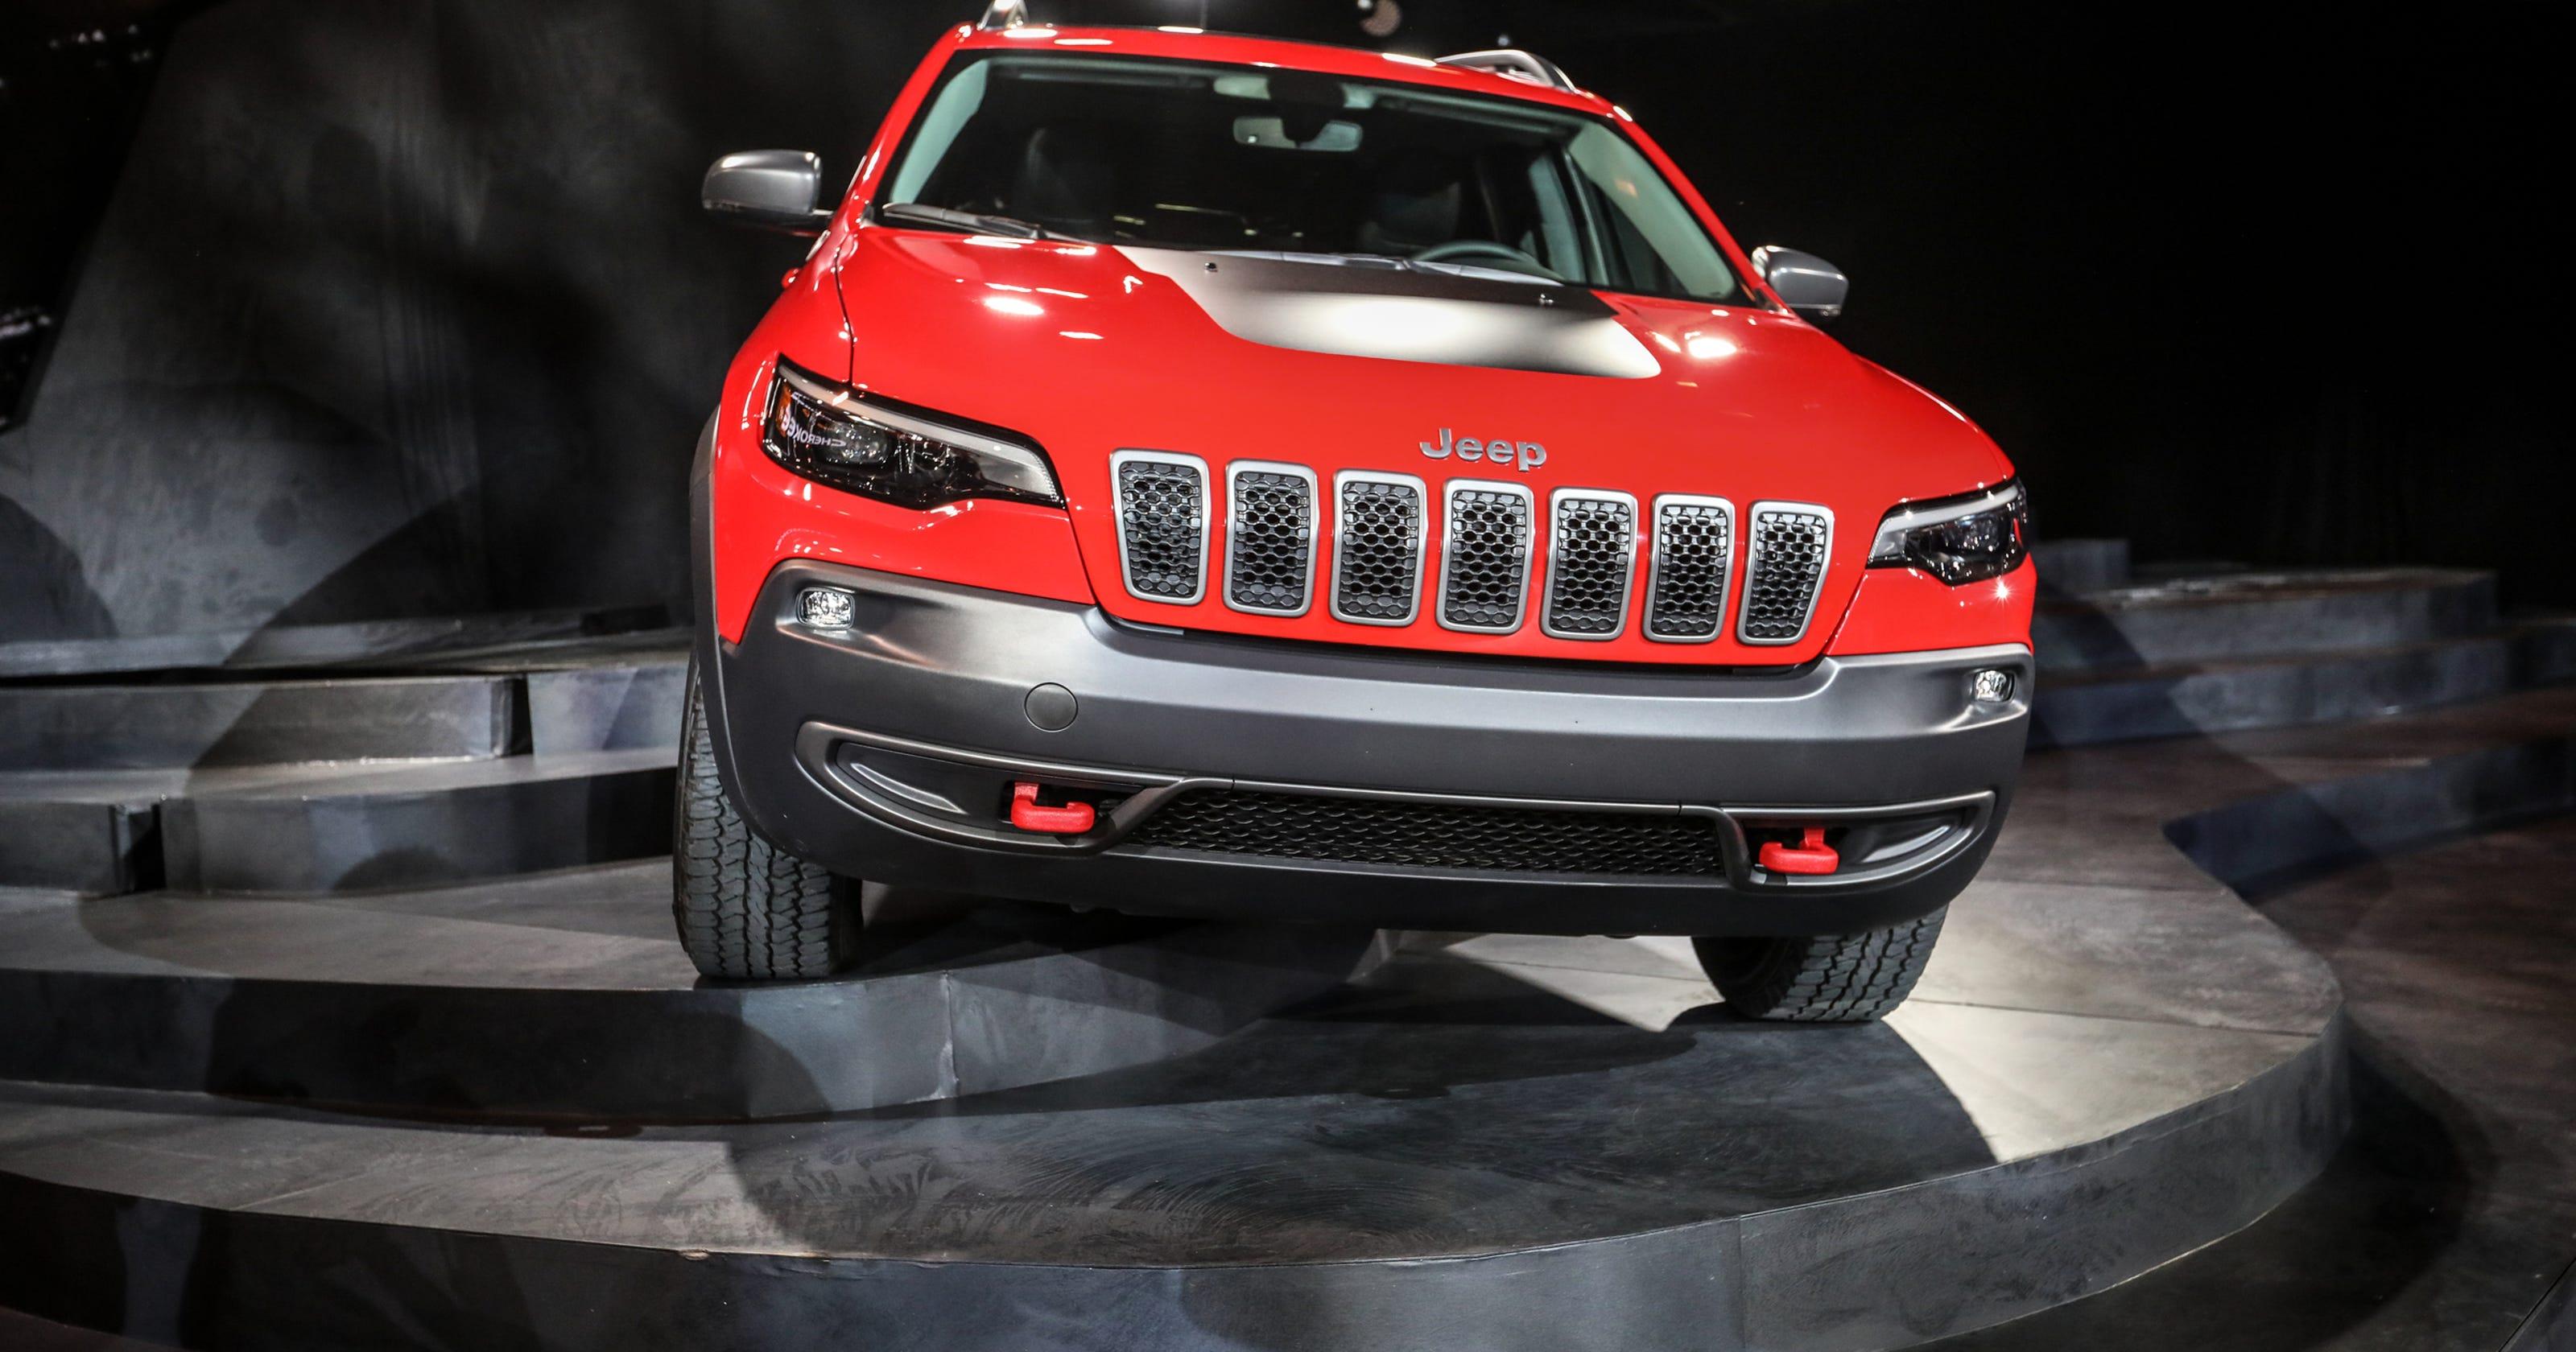 2019 Jeep Cherokee gets 270-hp turbo engine option